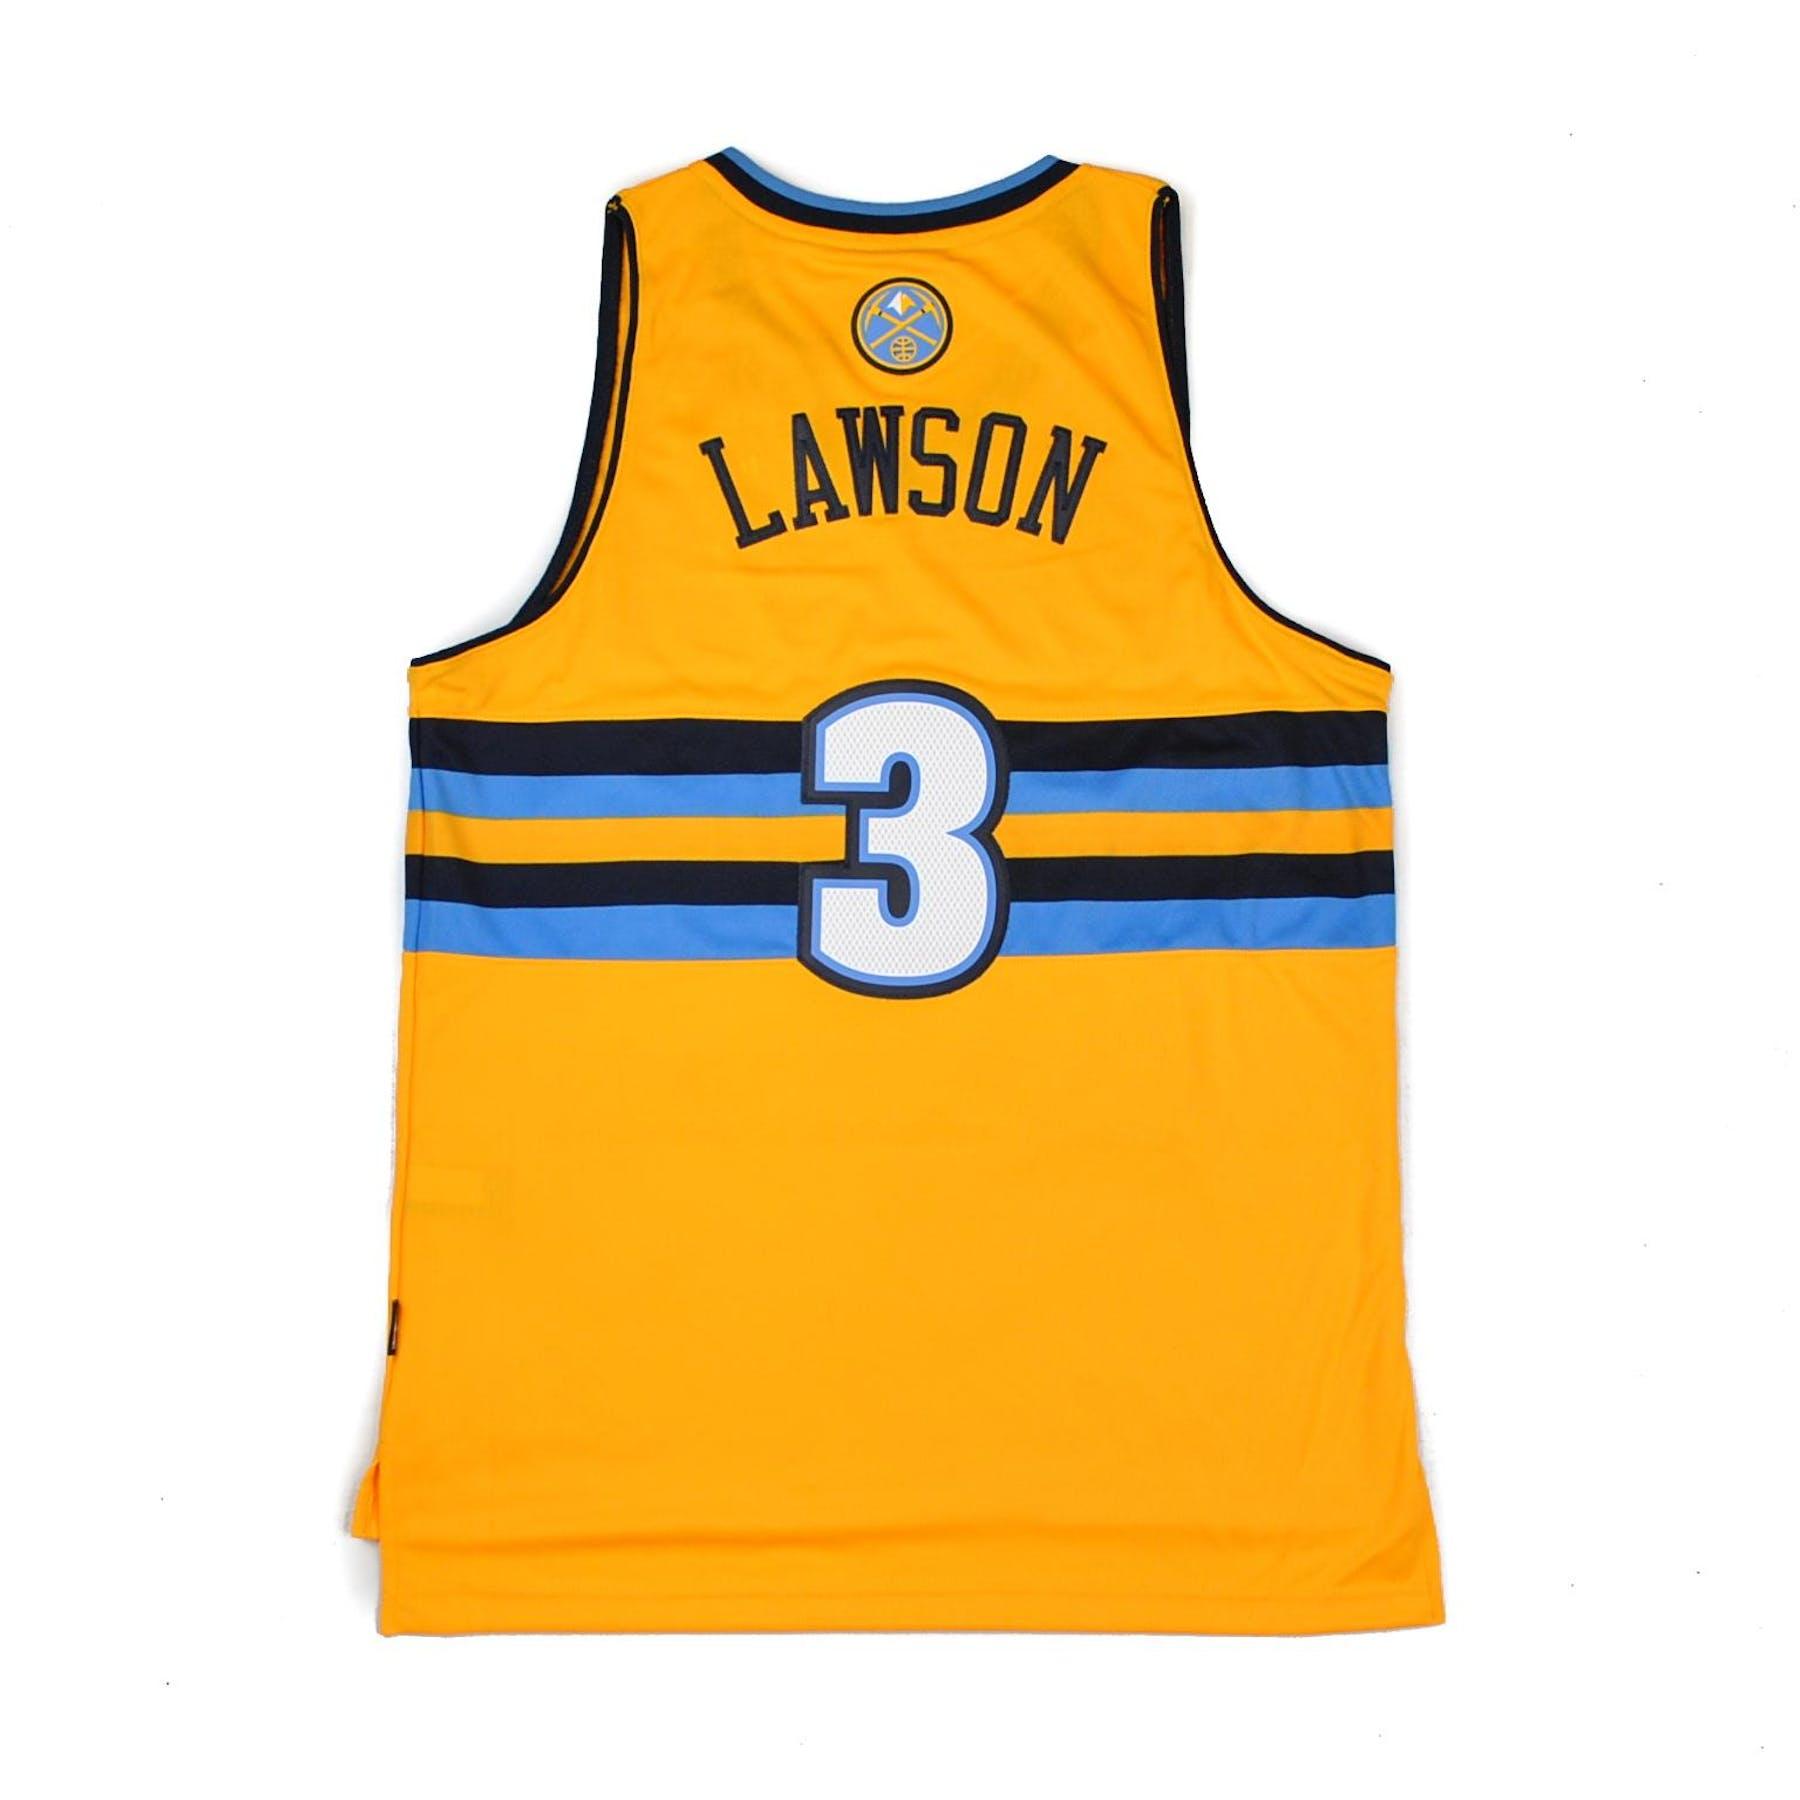 Adidas Denver Nuggets 3 Stripe Jacket: Denver Nuggets Ty Lawson Adidas Gold Swingman #3 Jersey